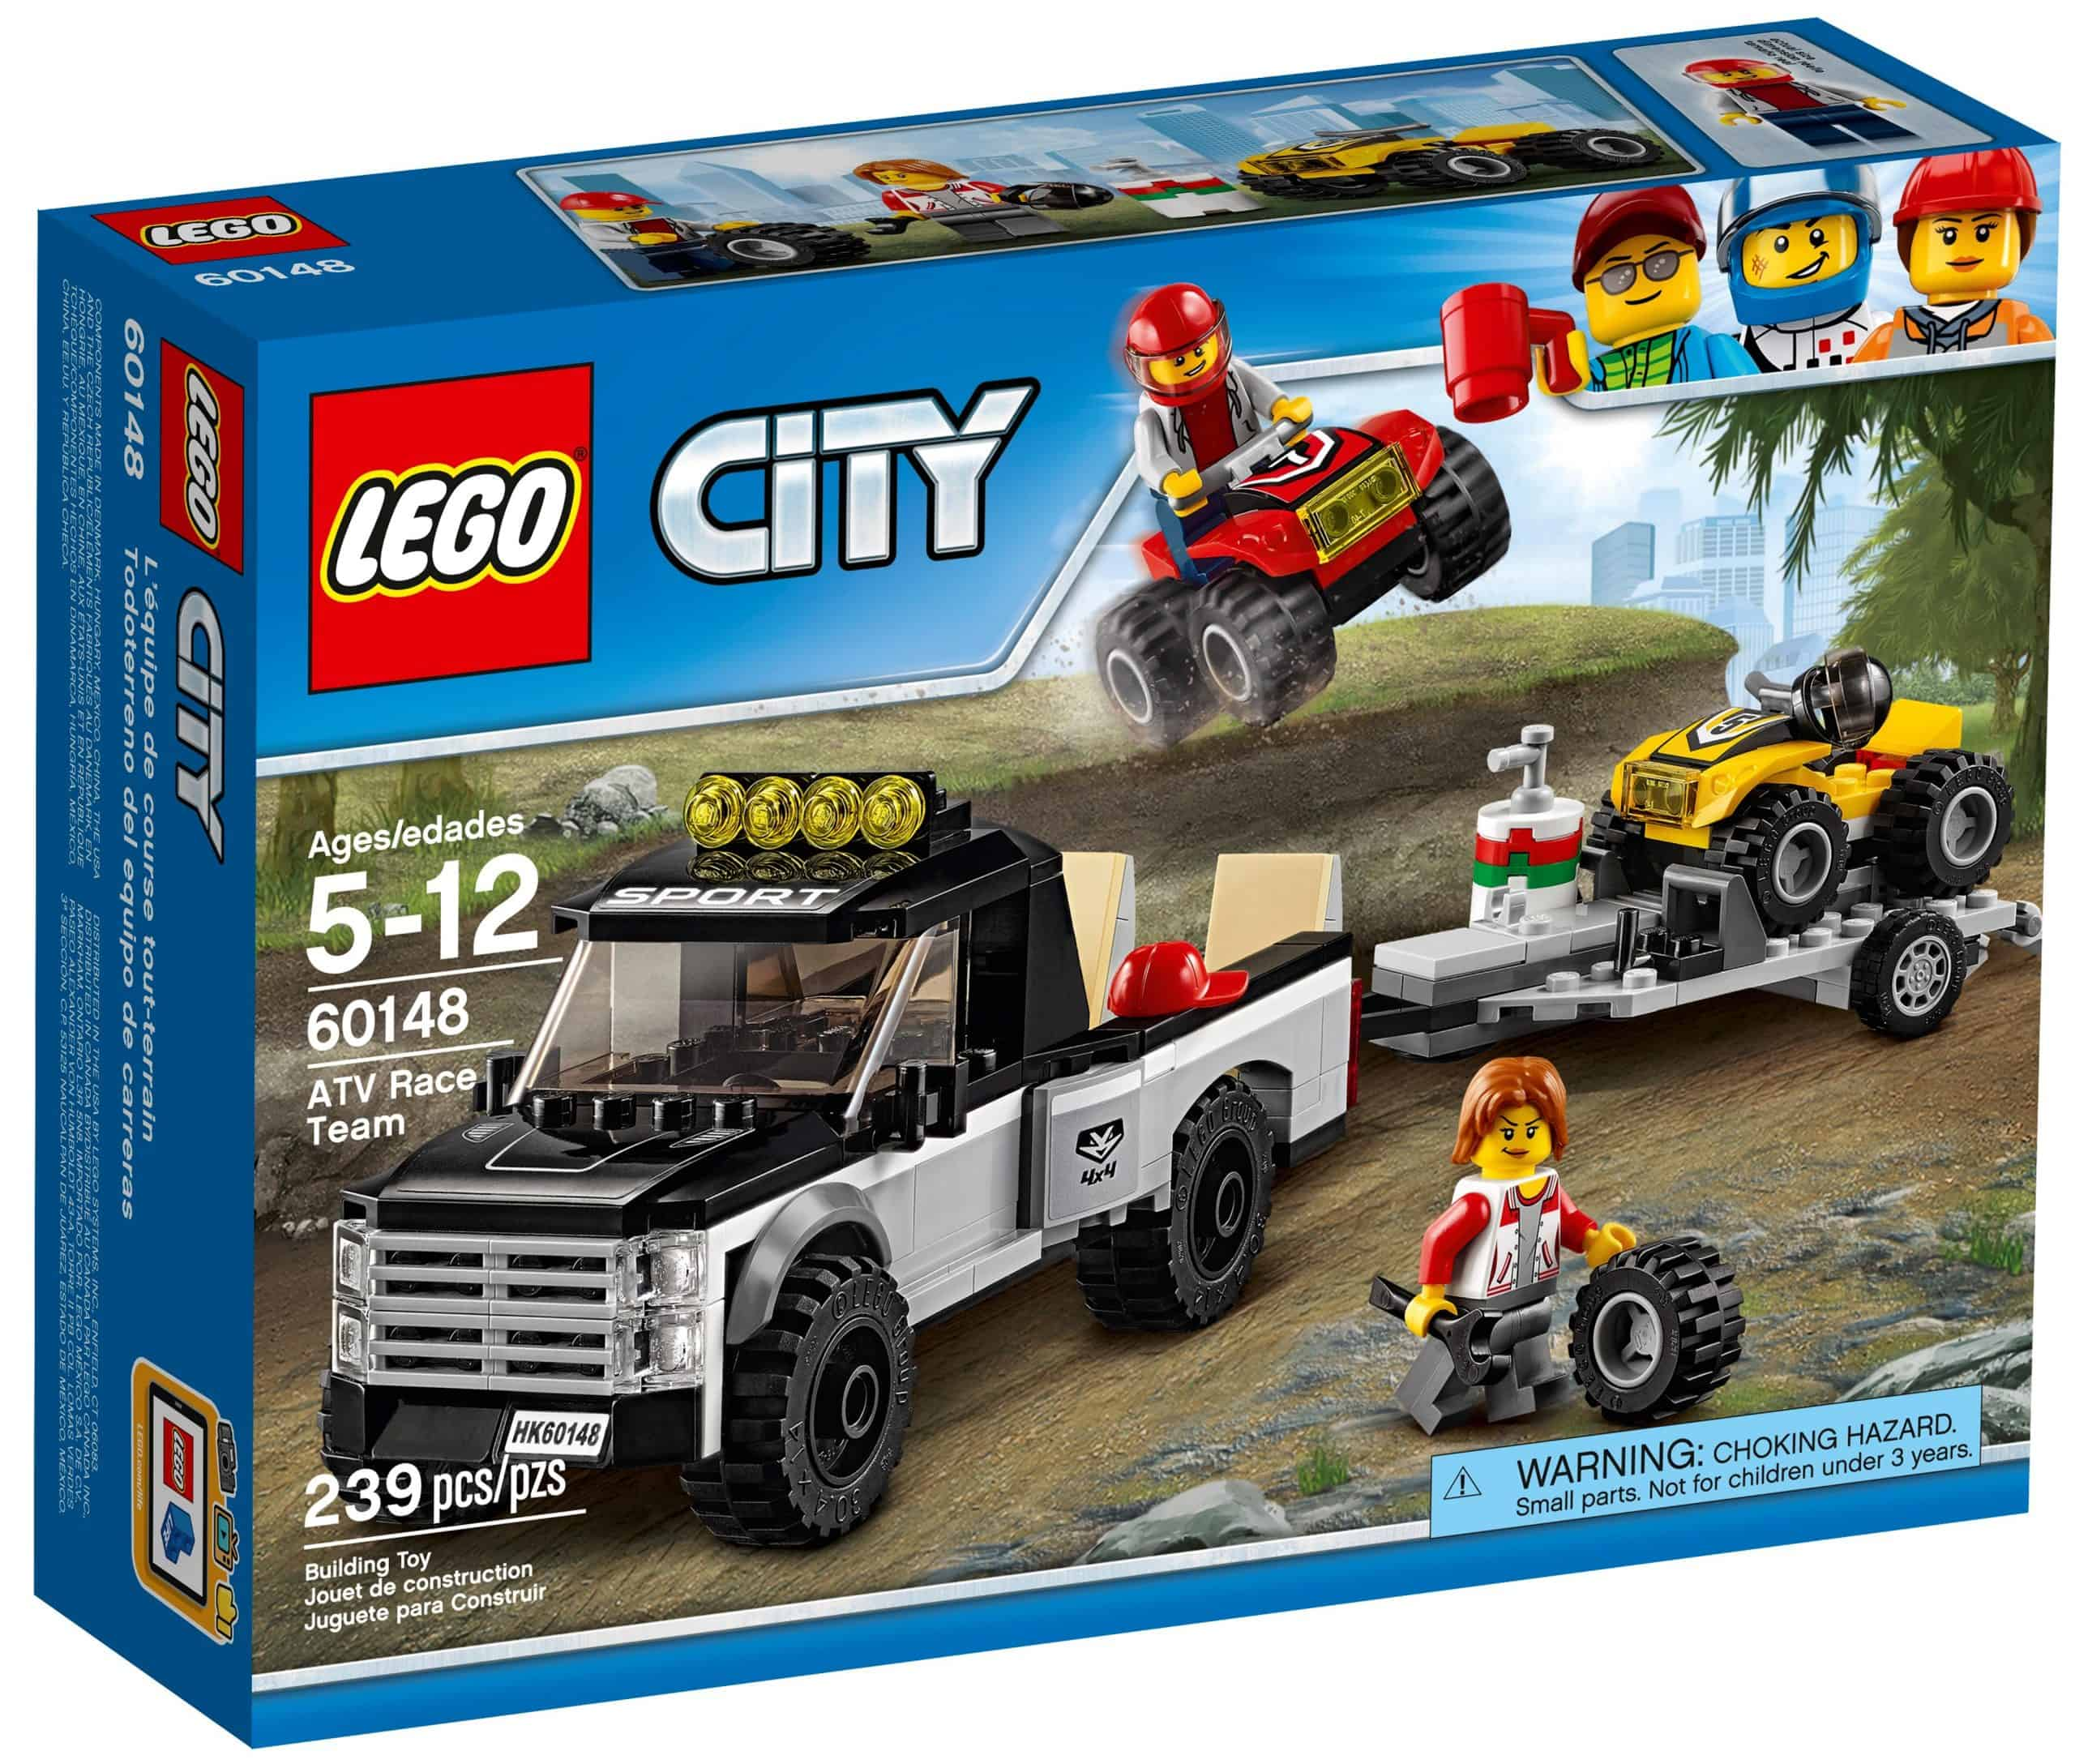 lego 60148 atv racerteam scaled